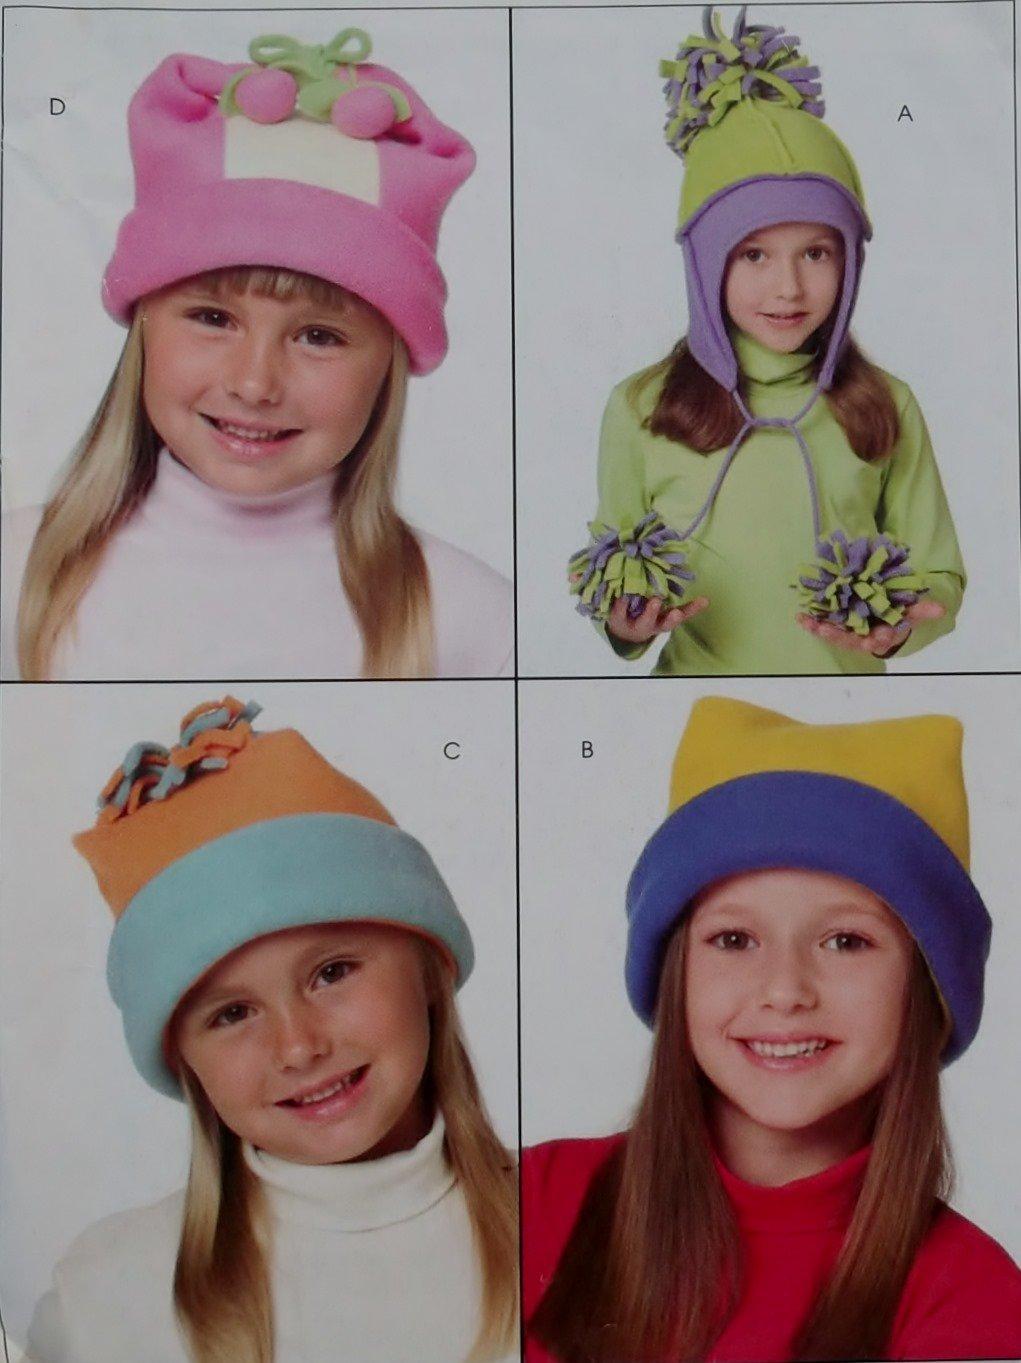 McCalls M 4957 Easy Girls' & Boys' Hat in 4 sizes Pattern, Size S M L XL, UNCUT FF